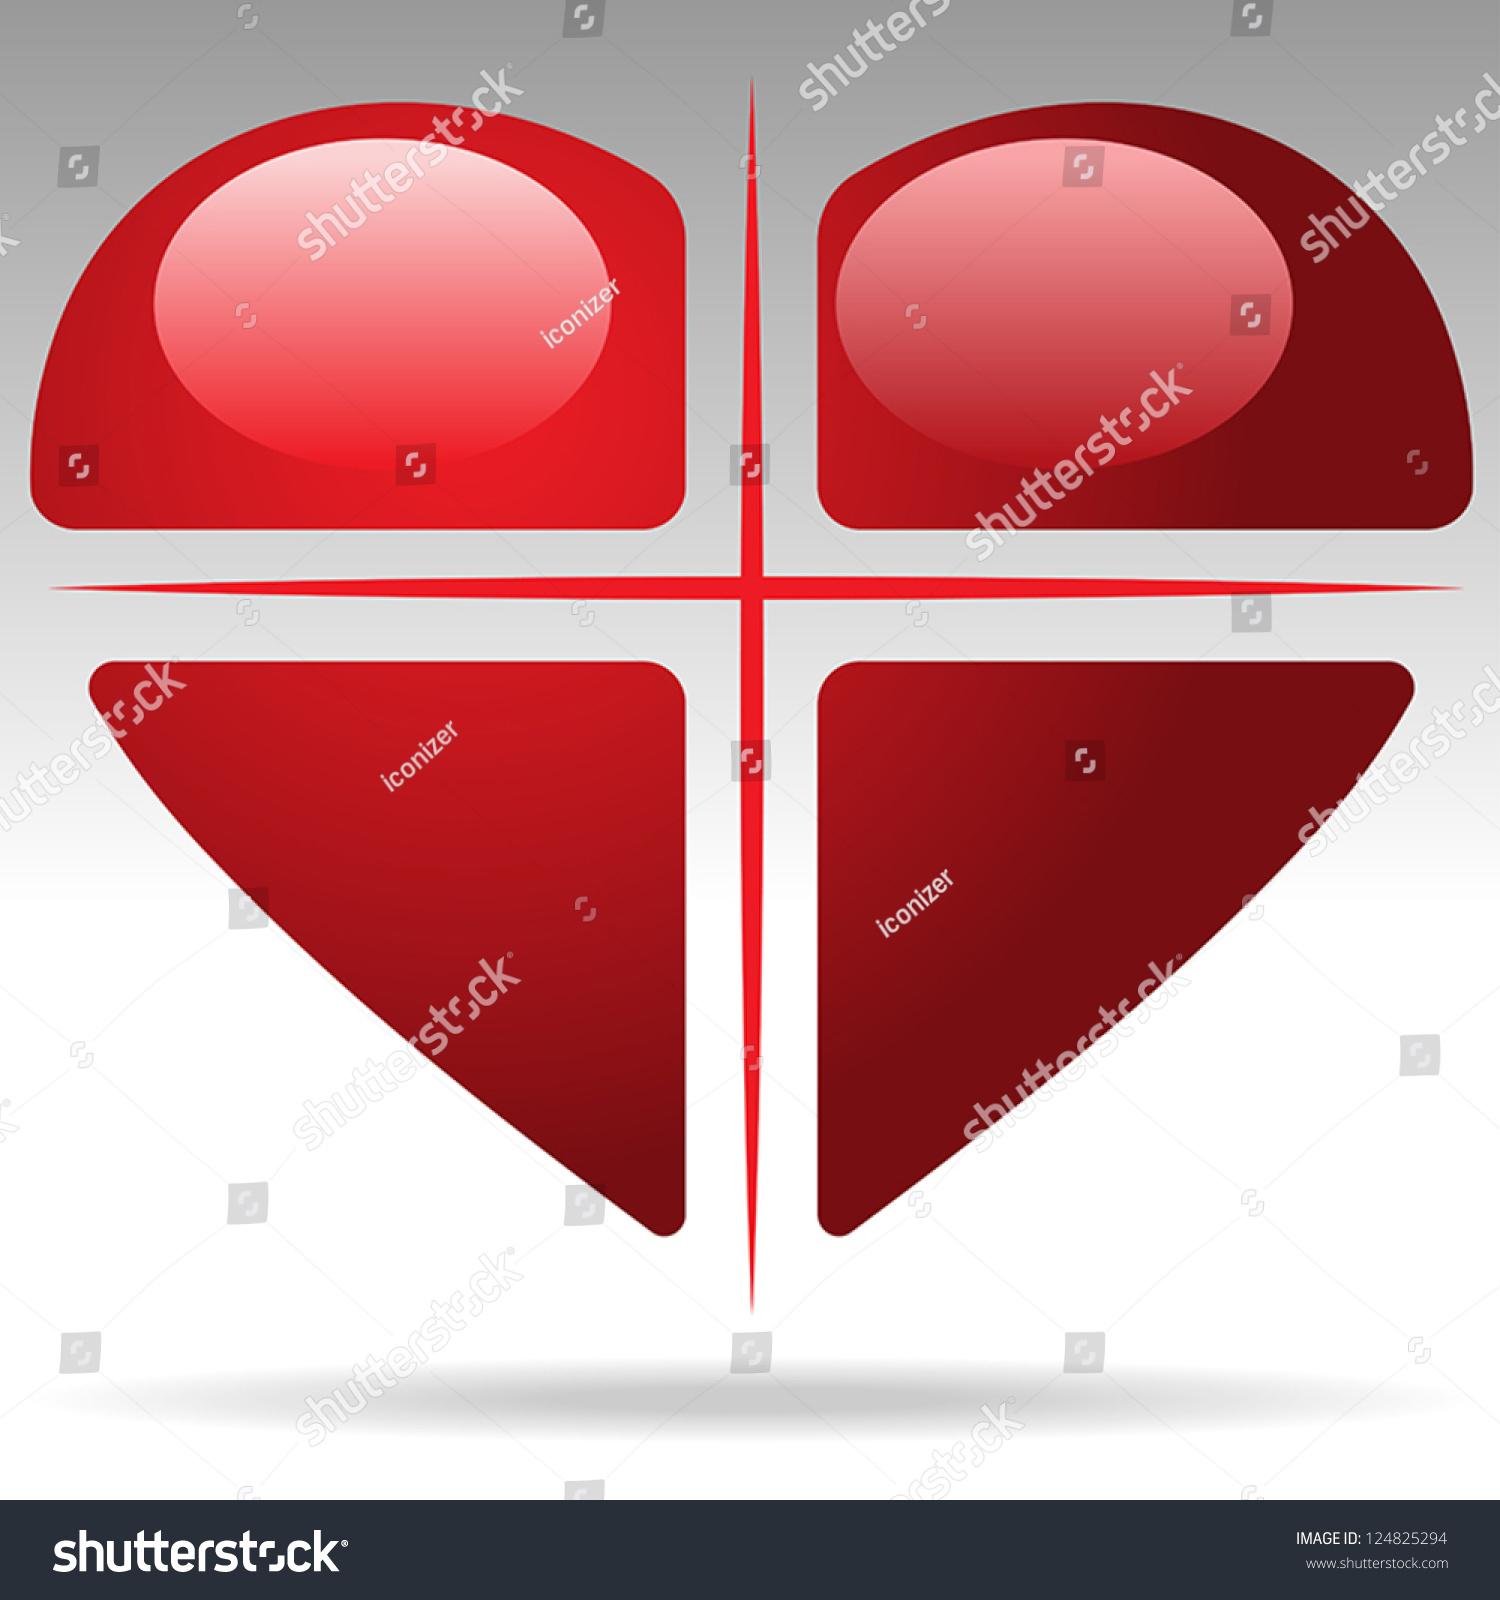 Cross Heart Vector - 124825294 : Shutterstock